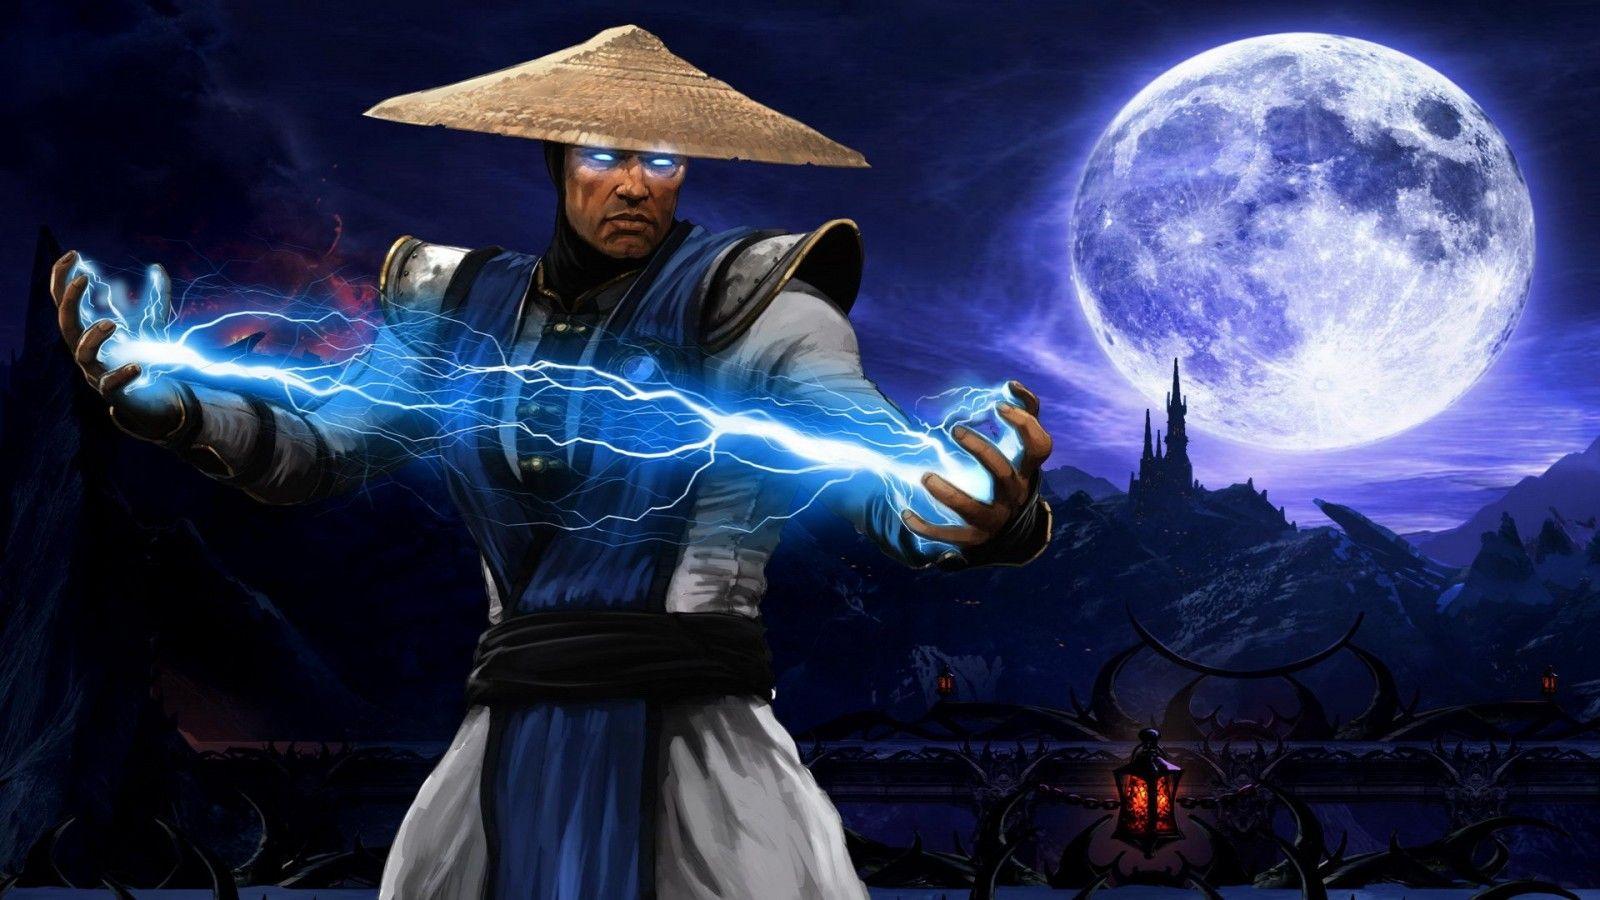 Pin By Shane Mccoy On Mortal Kombat Raiden Mortal Kombat Mortal Kombat Mortal Kombat X